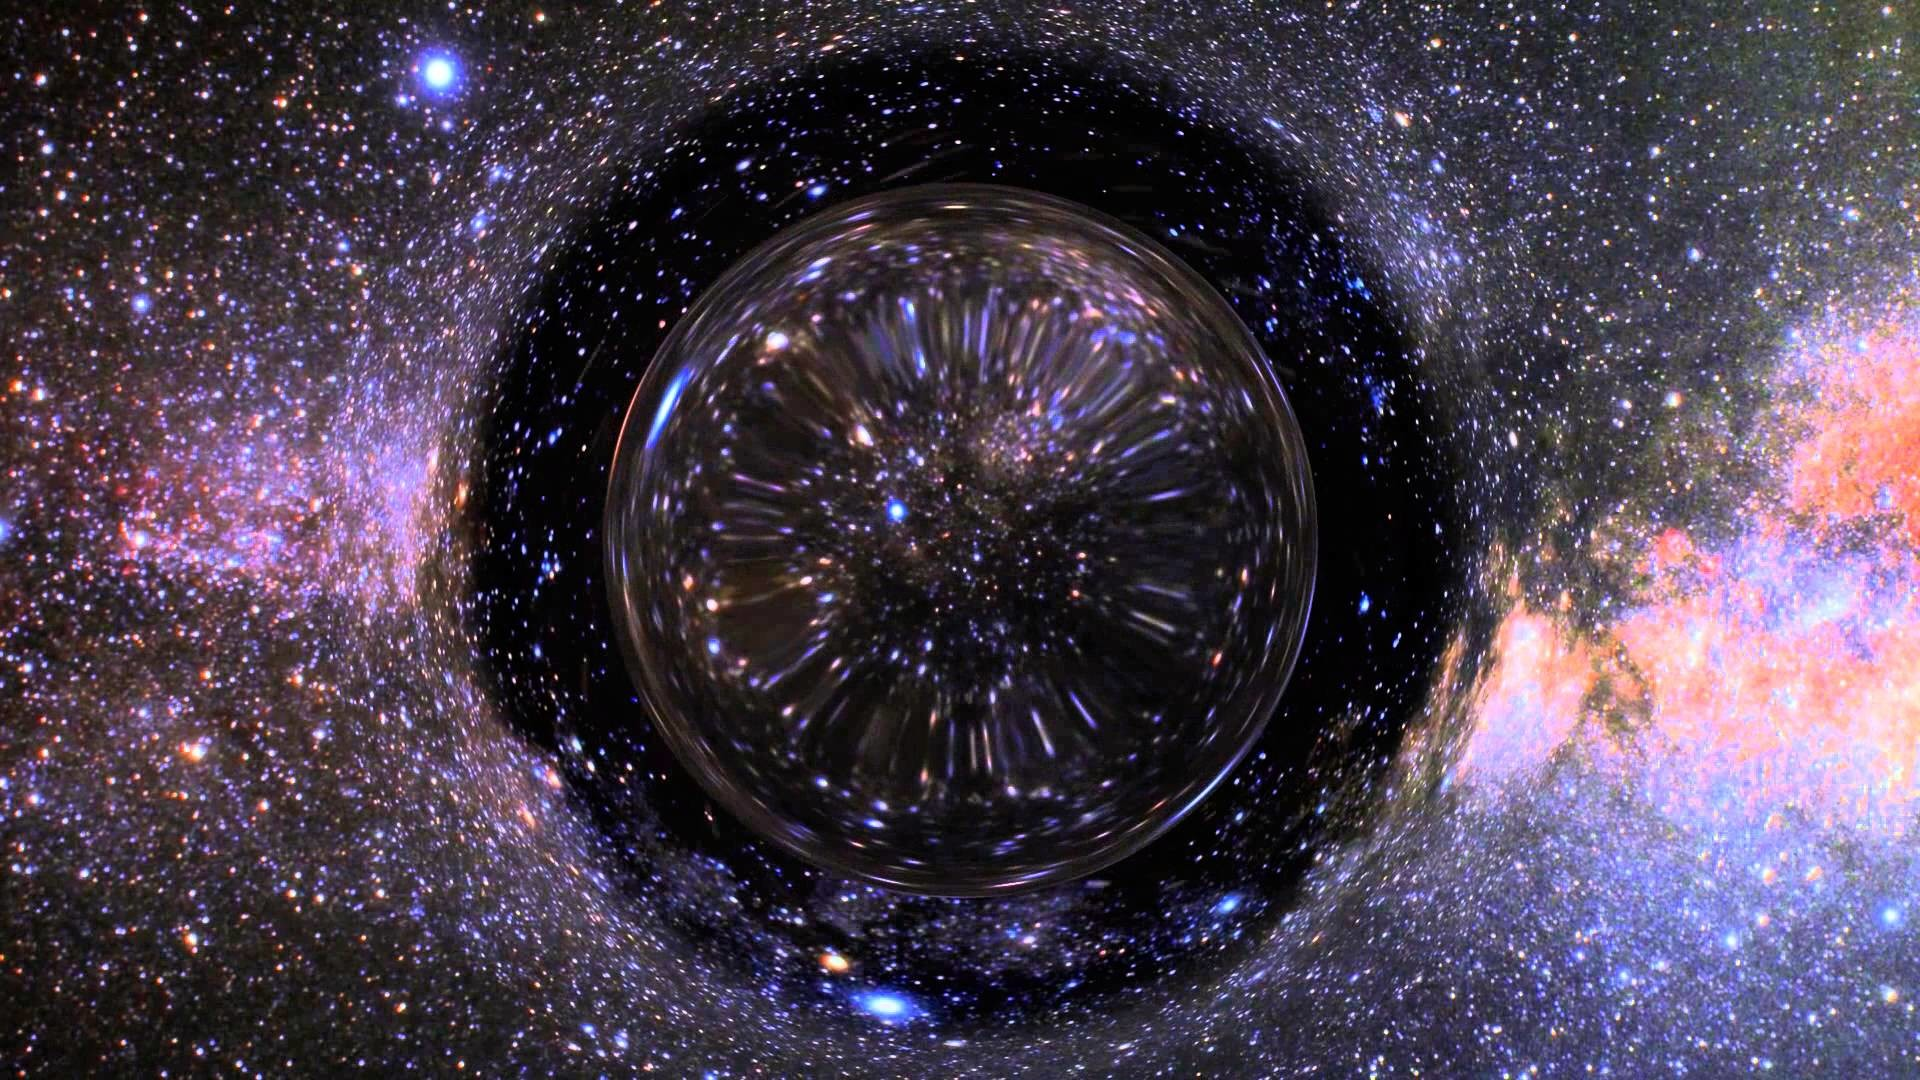 Interstellar Wormhole Wallpaper (70+ images)